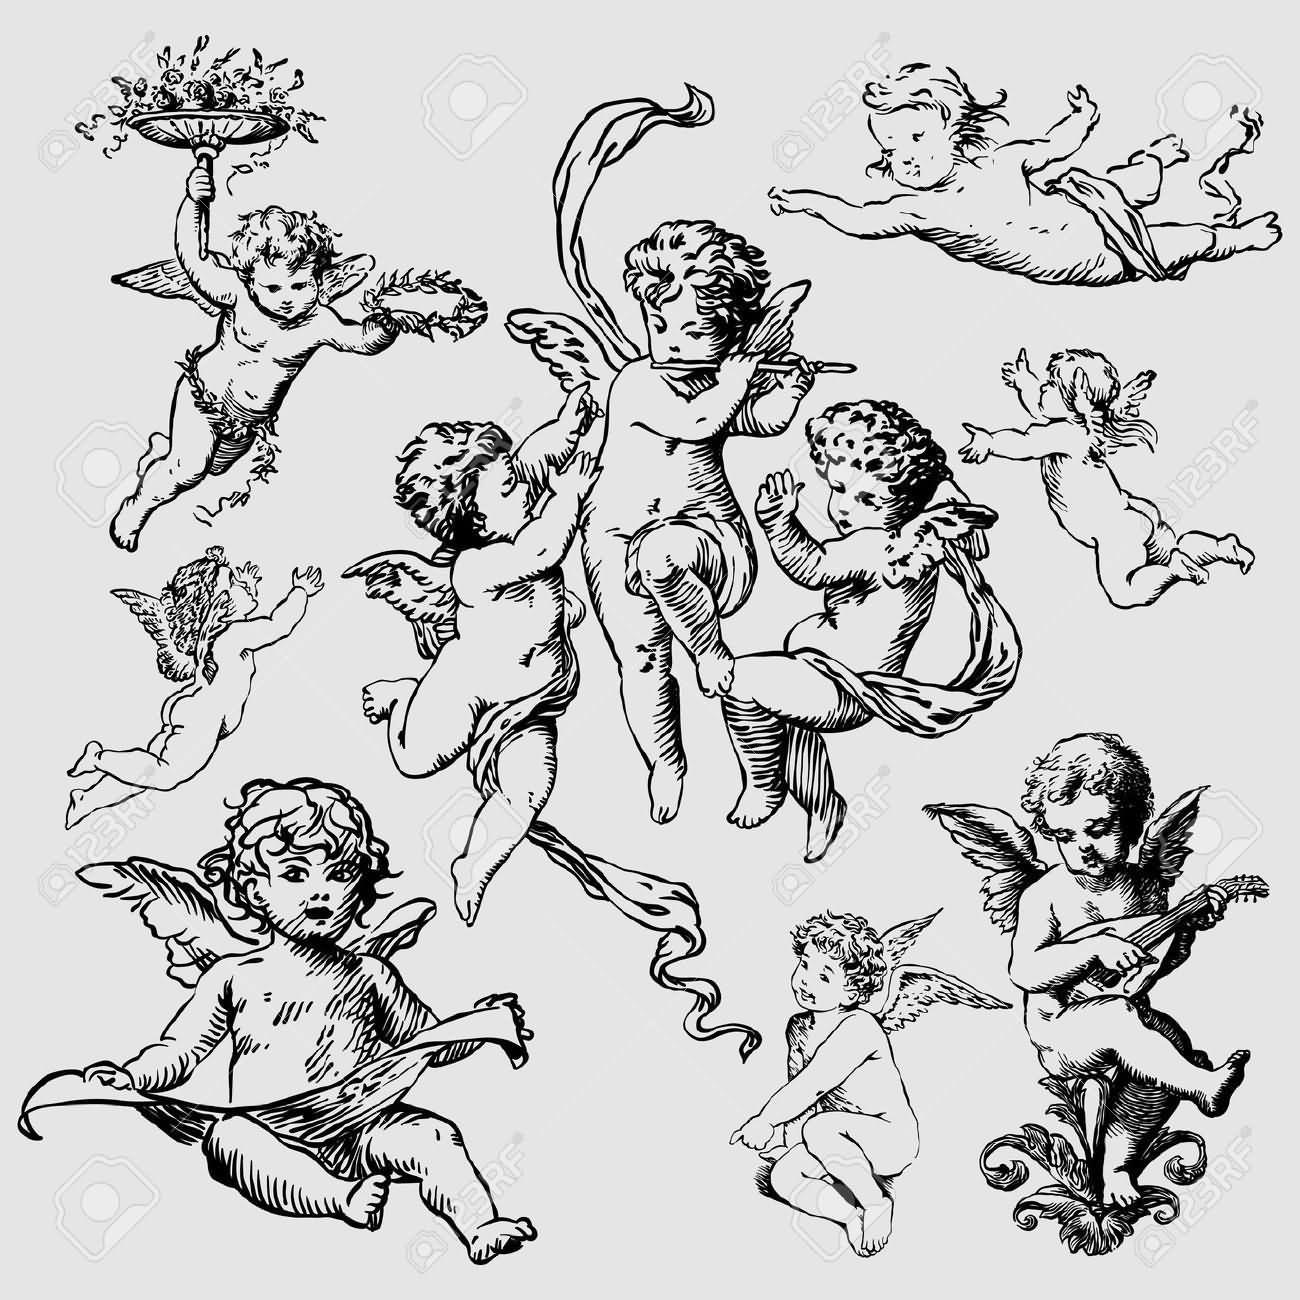 25 Cute Cupid Cherub Tattoo Designs